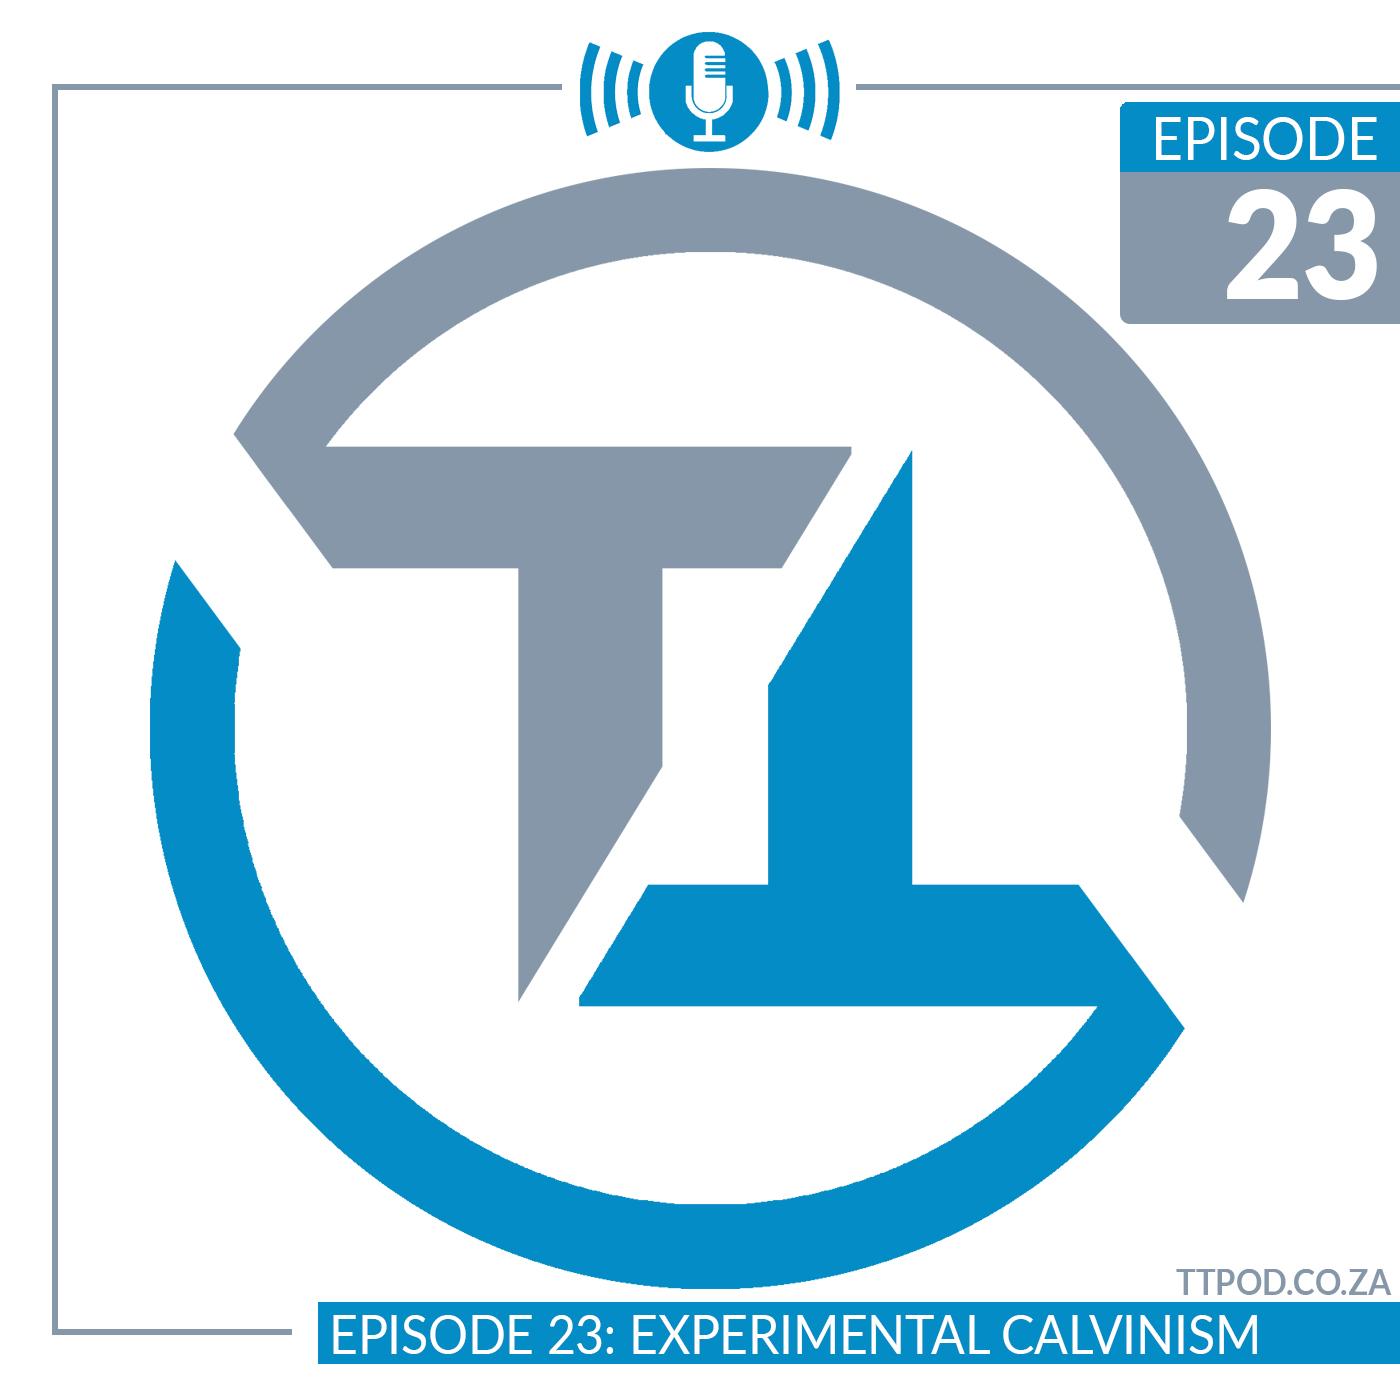 Episode 23: Experimental Calvinism